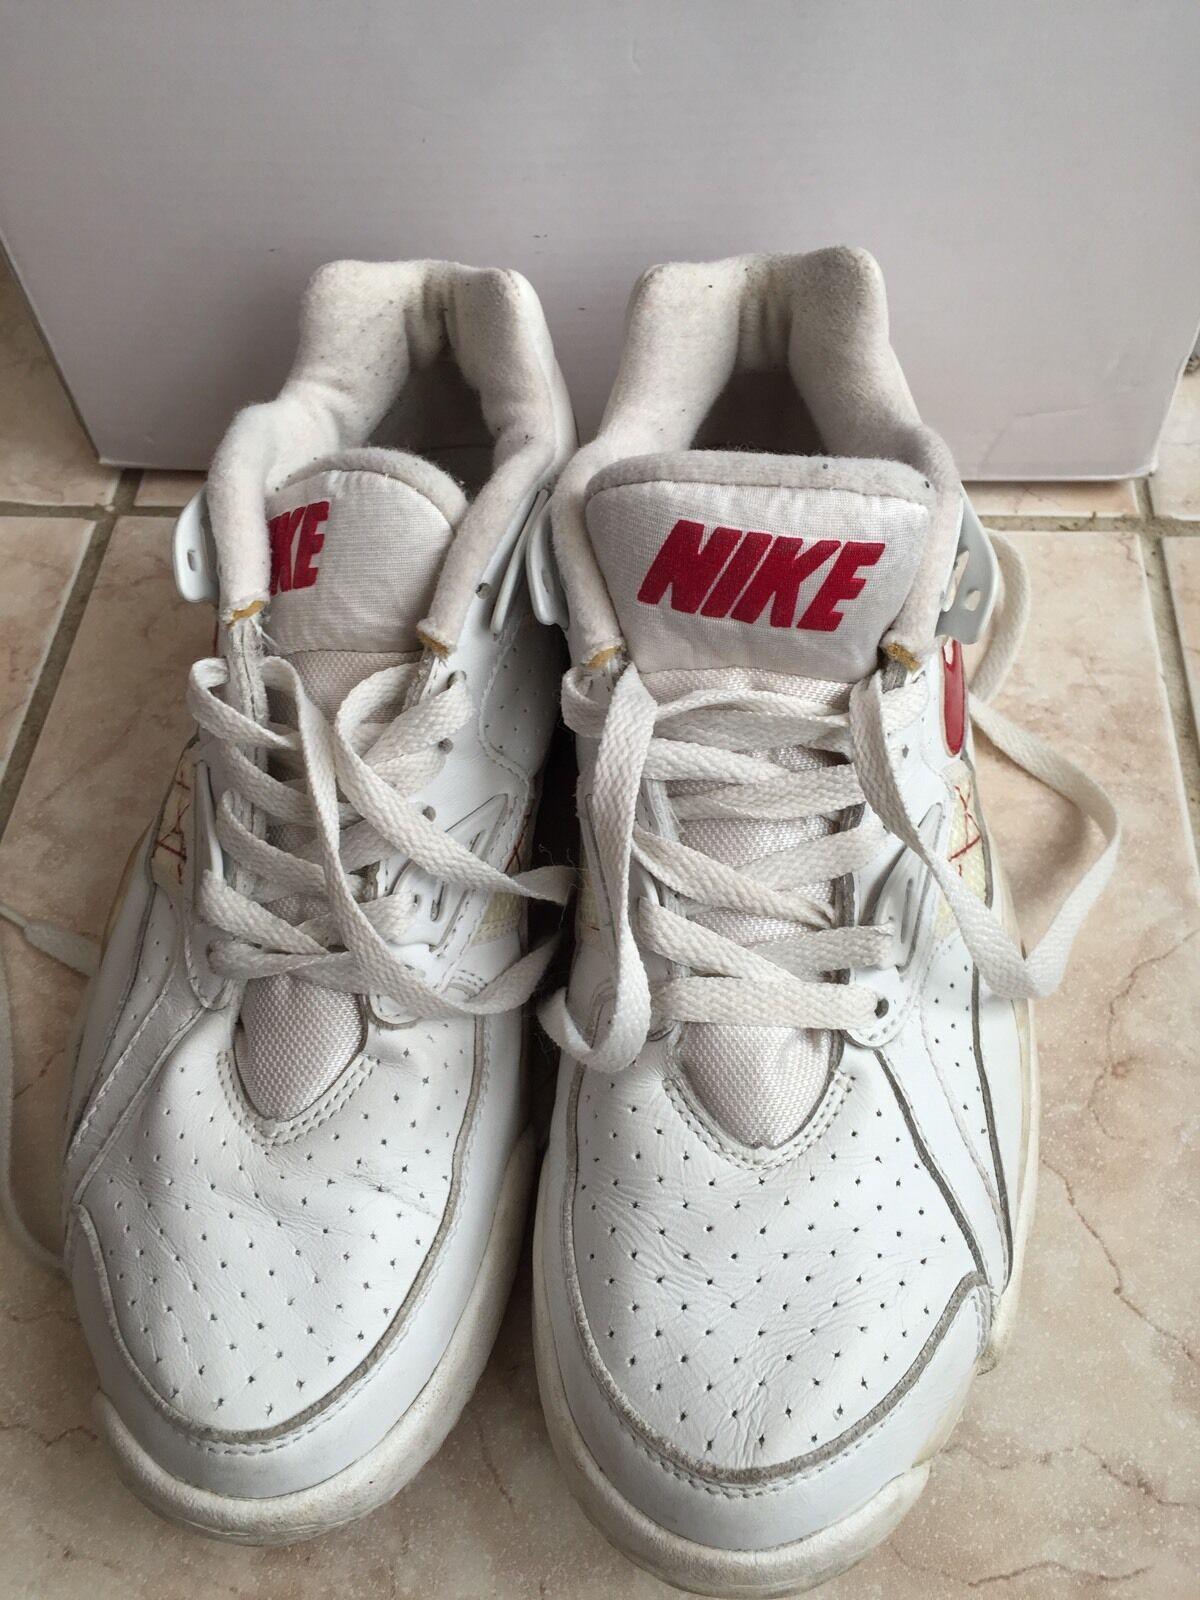 Nike Air Trainer SC High Bo jackson White/Red Sz 7